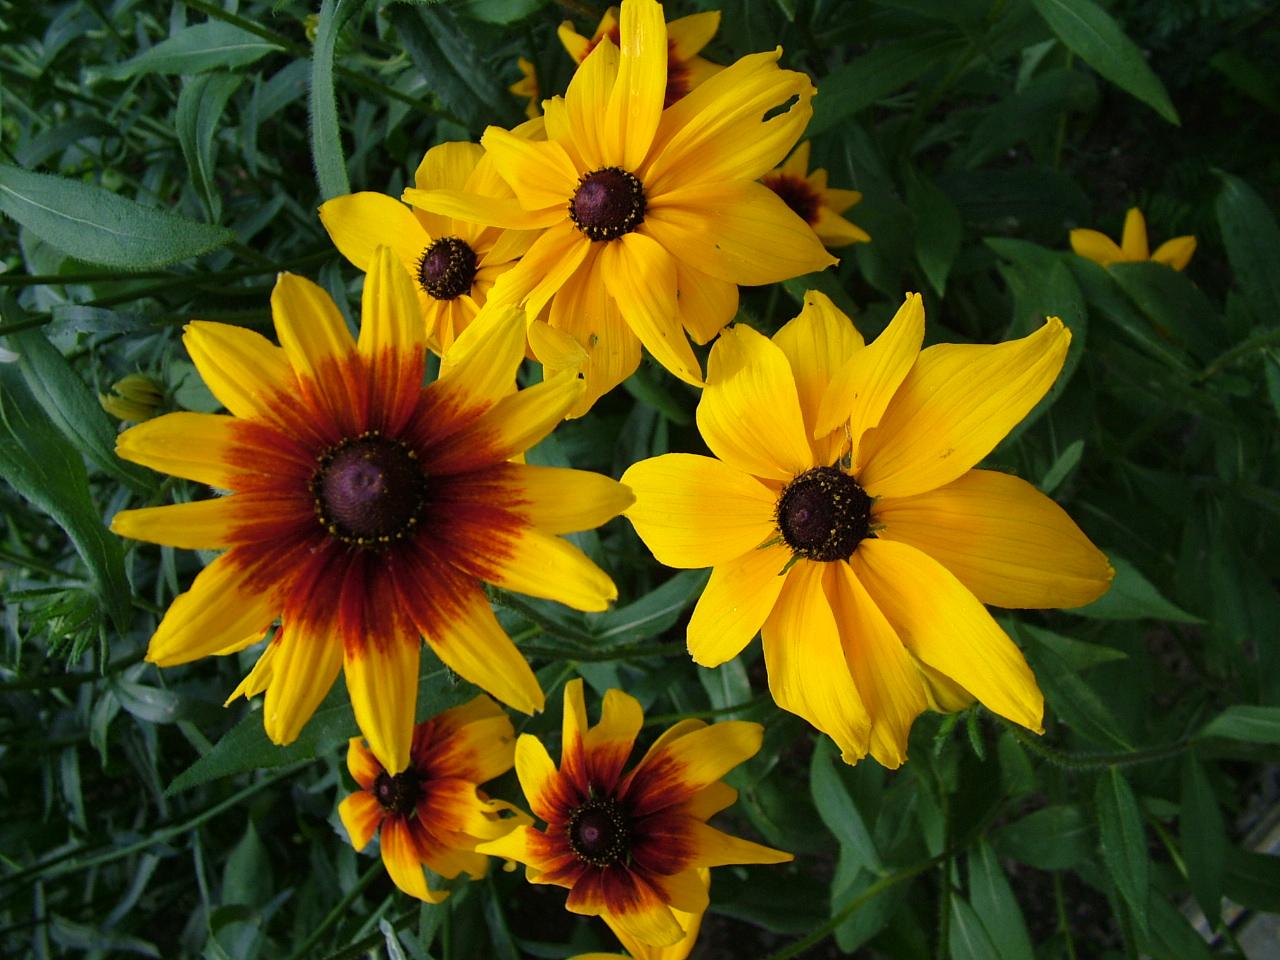 Index of wallpapersflowers 4xls yellow brown flowersg mightylinksfo